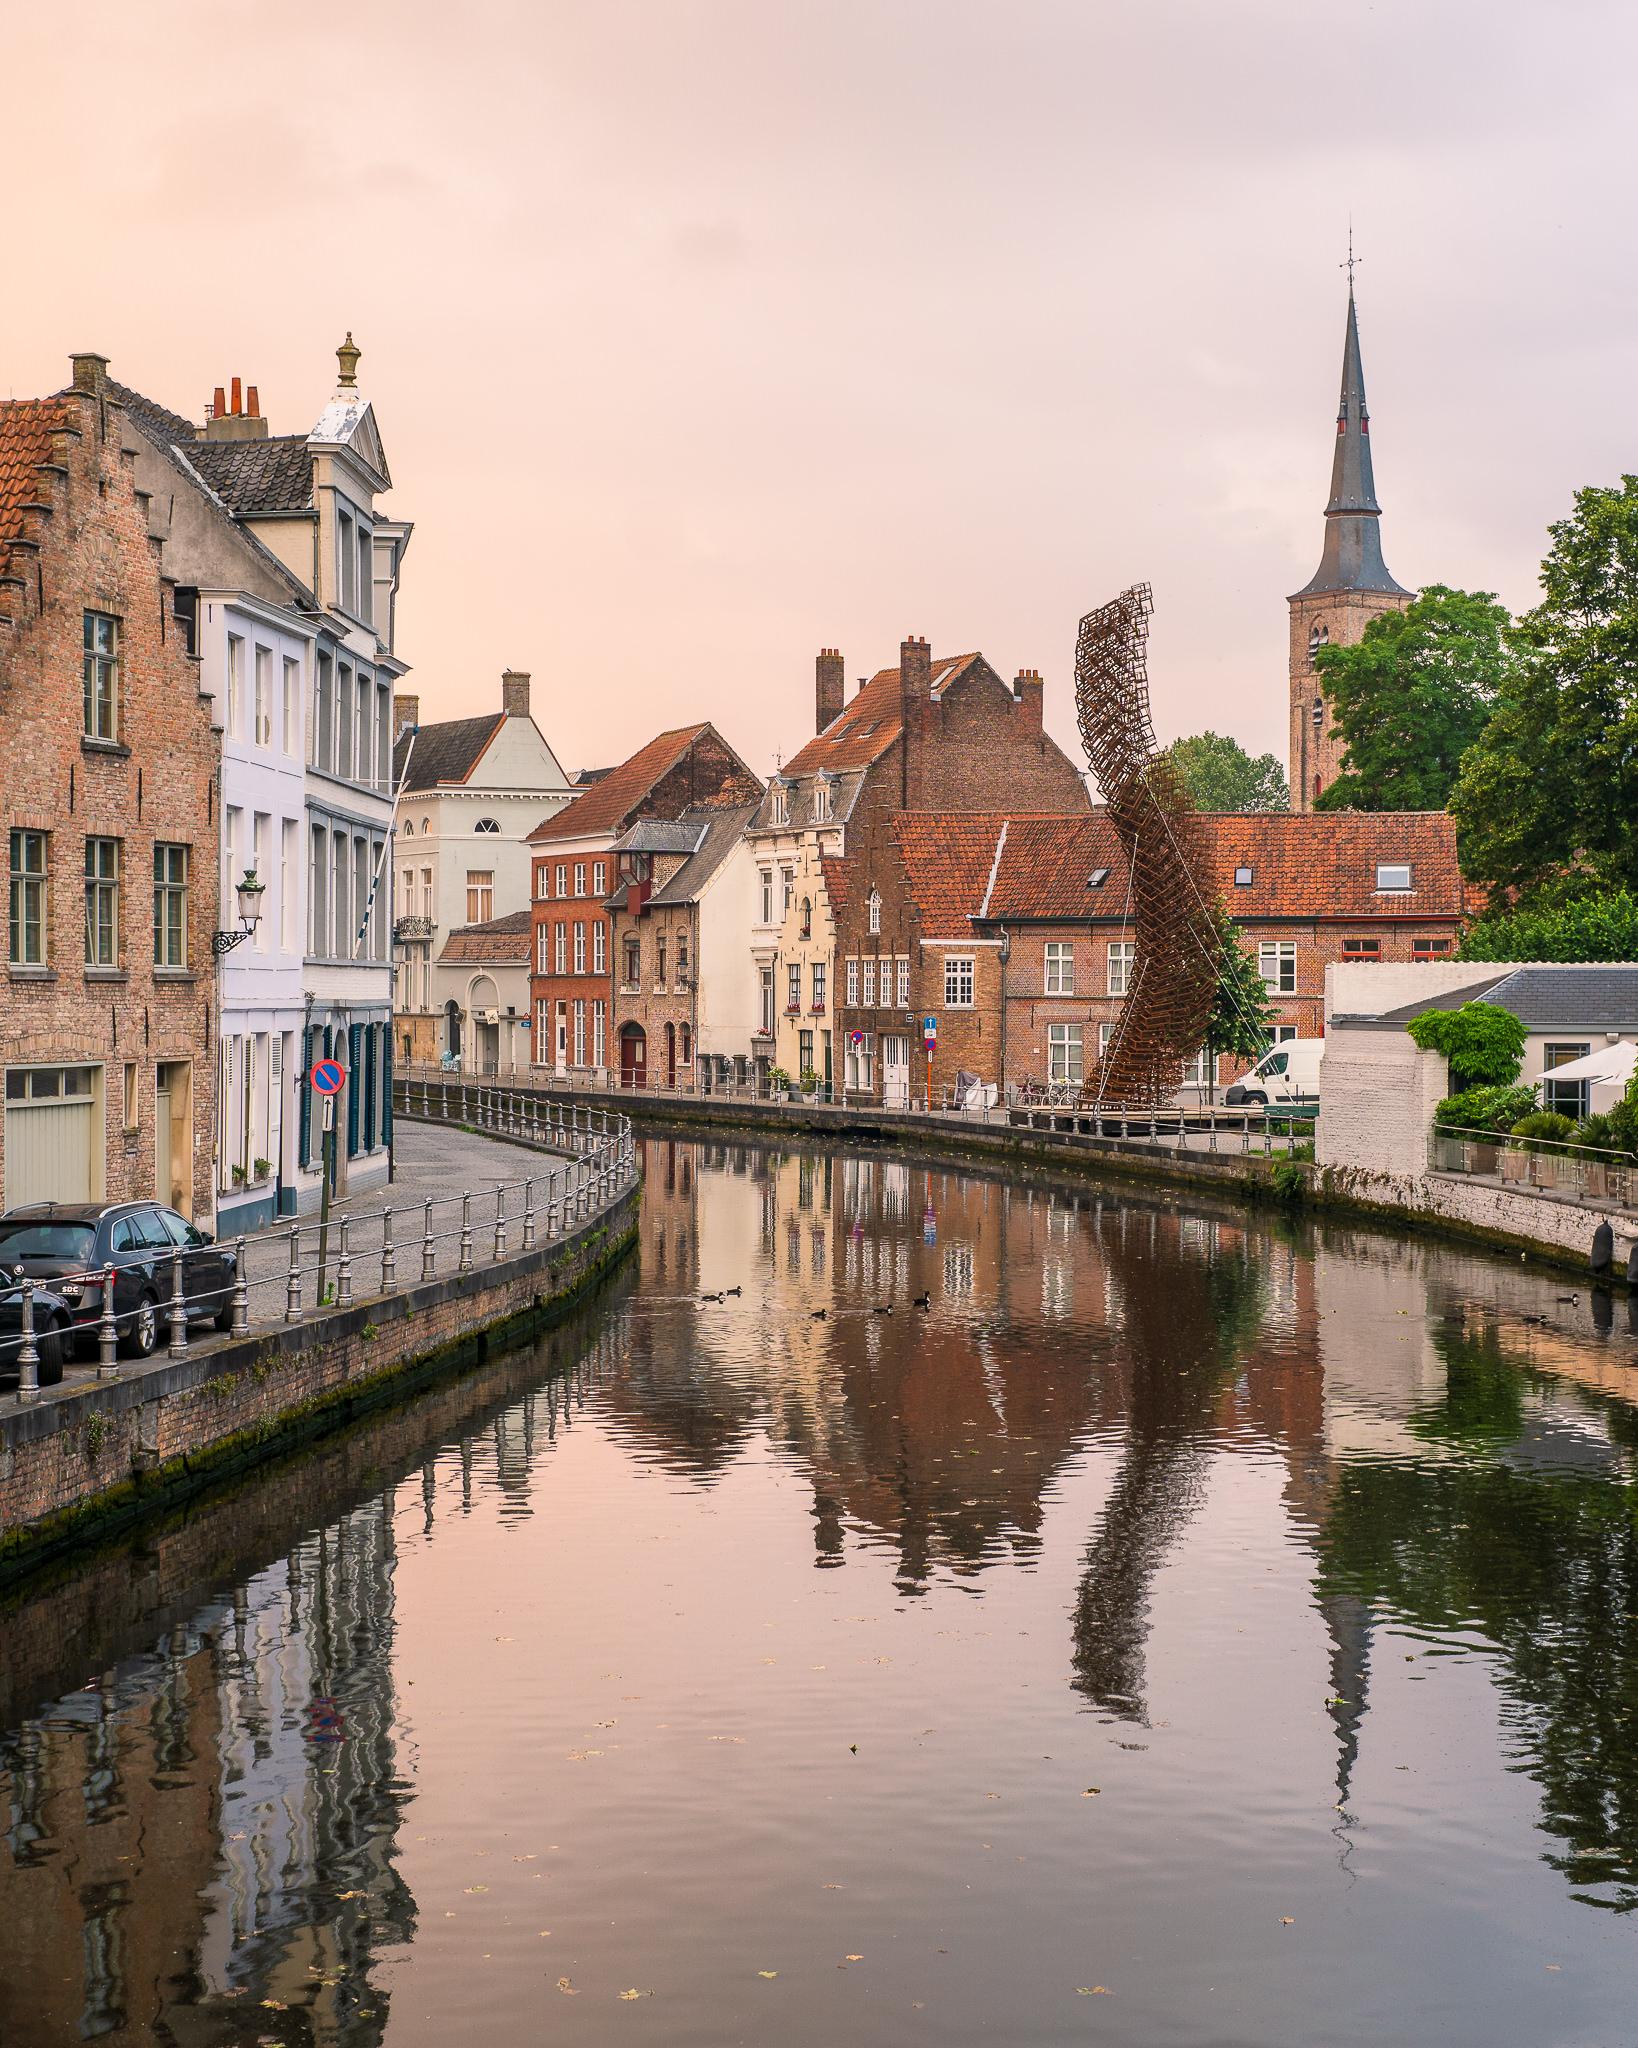 Bruges Canal at Sunset